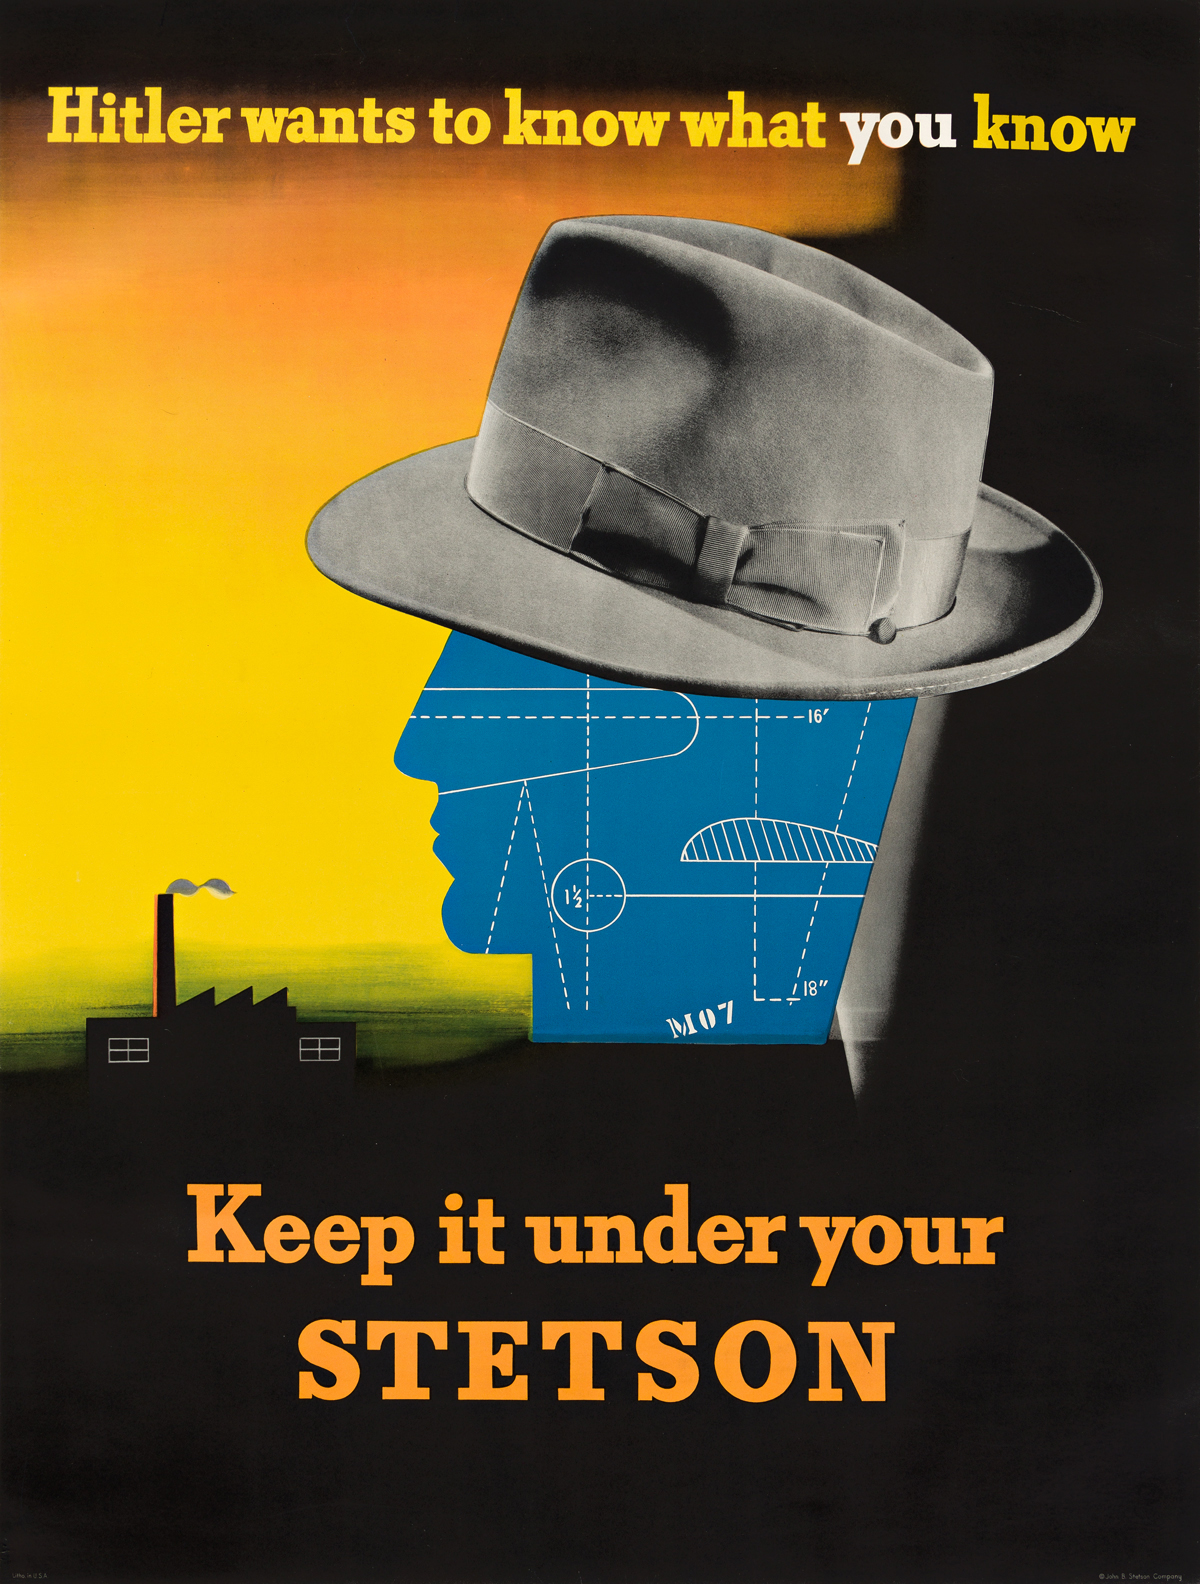 EDWARD MCKNIGHT KAUFFER (1890-1954).  KEEP IT UNDER YOUR STETSON. 1942. 39x29¼ inches, 99x71¾ cm. John B. Stetson & Co., Philadelphia.